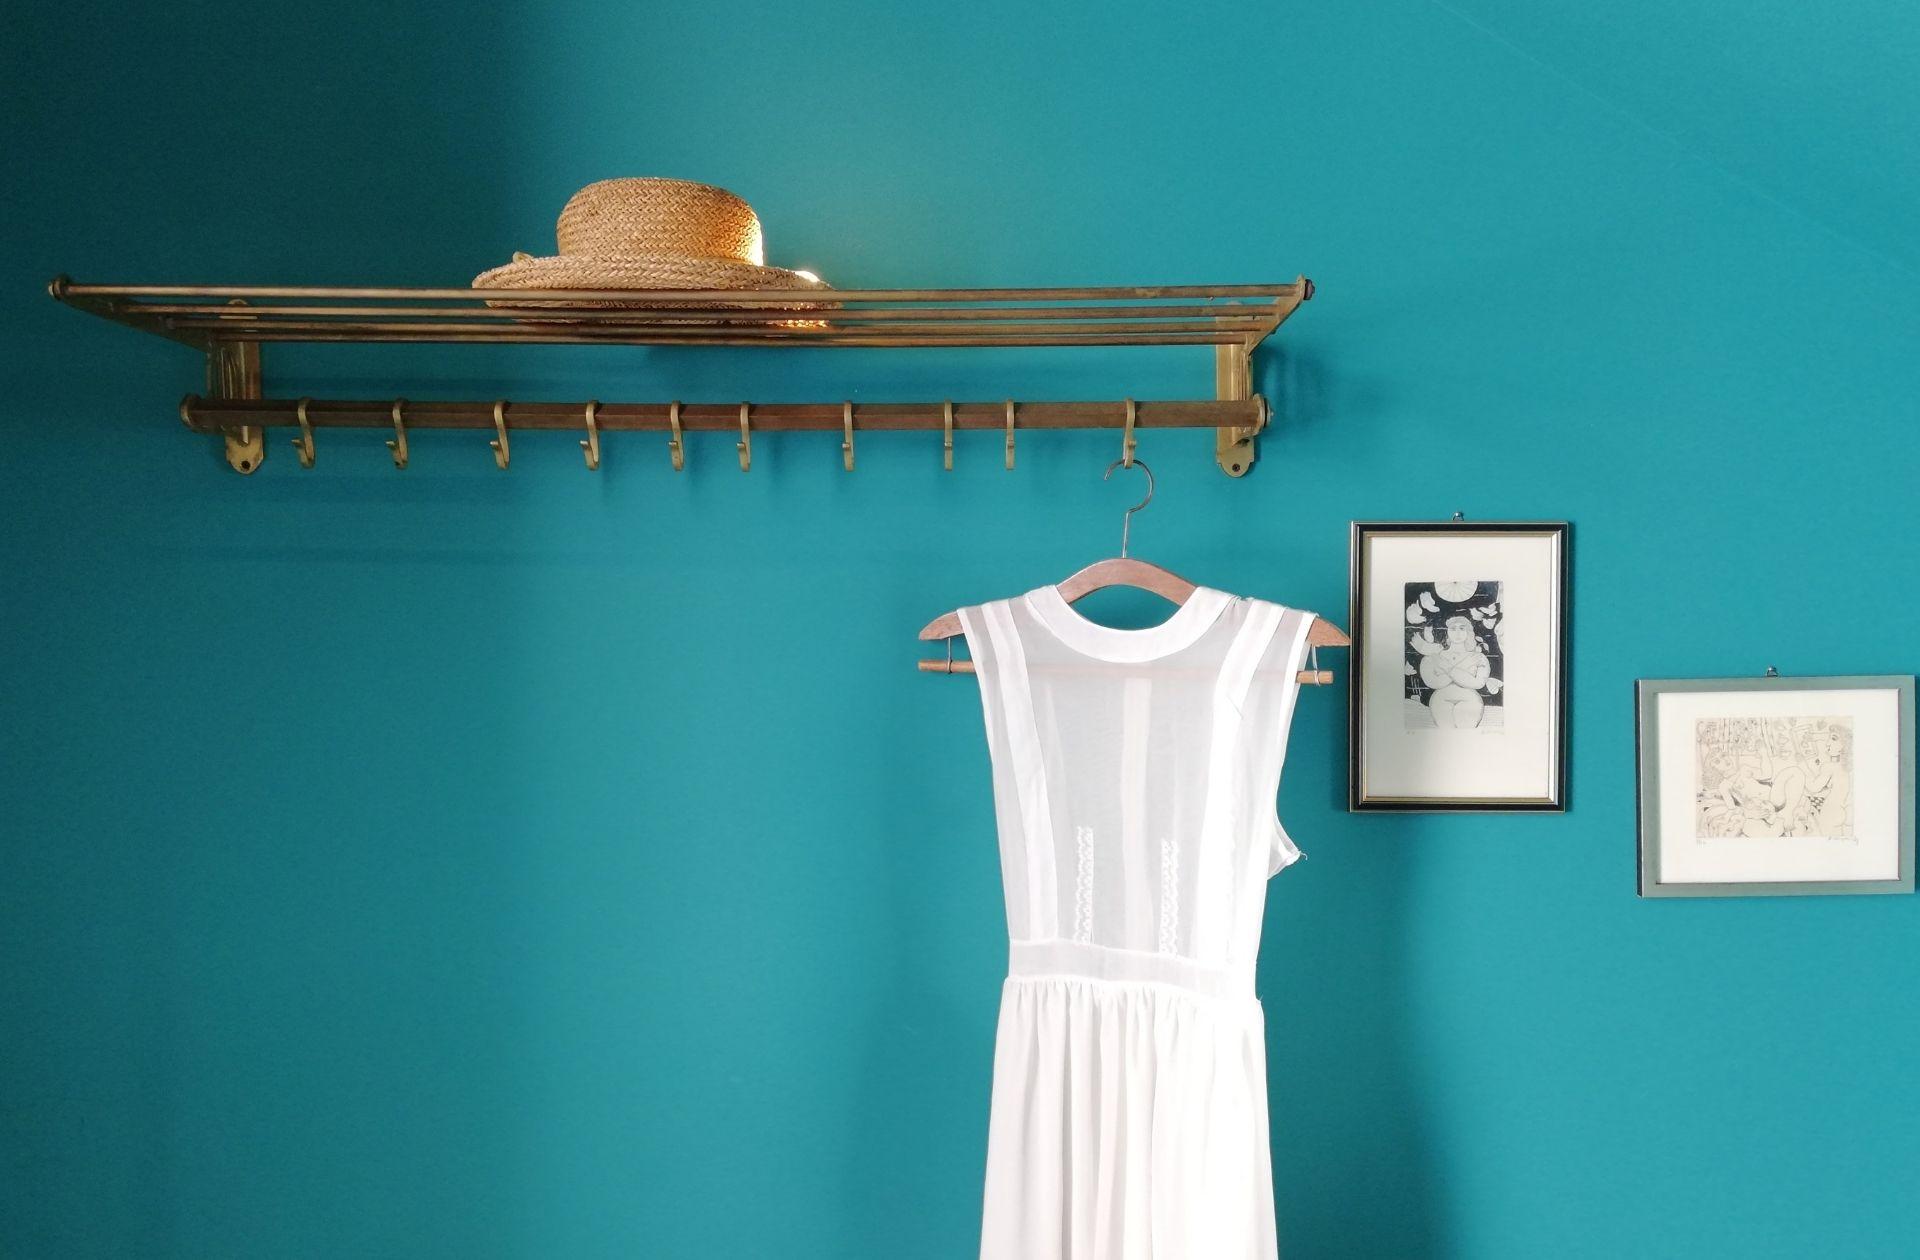 garde robe minimaliste sur fond bleu